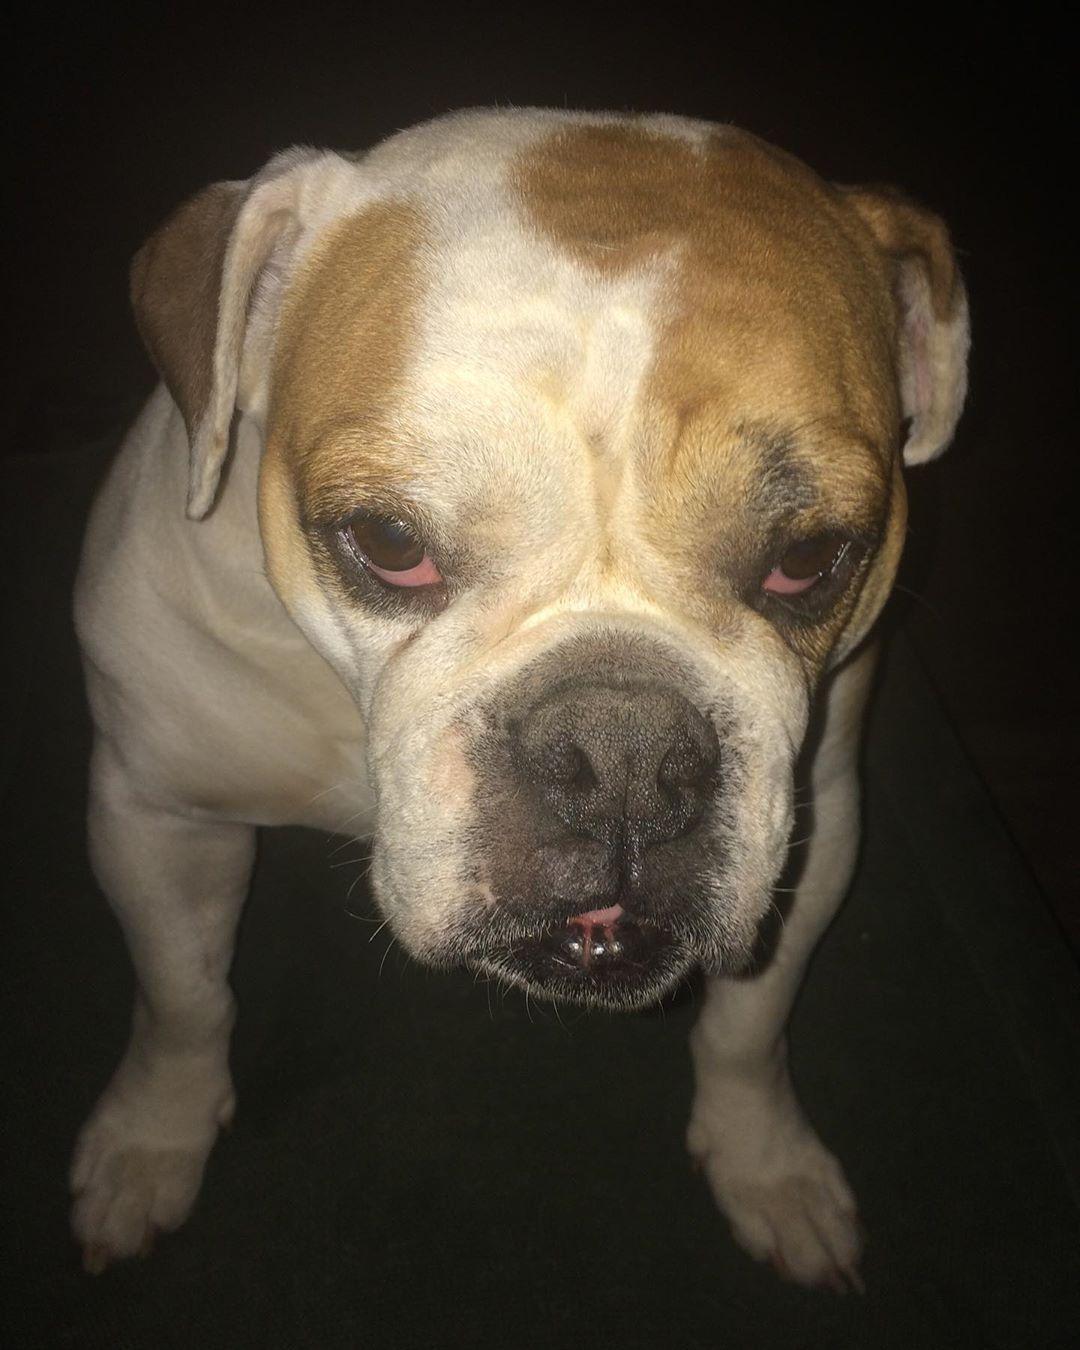 Follow Us For More DADA bulldogbulldogs